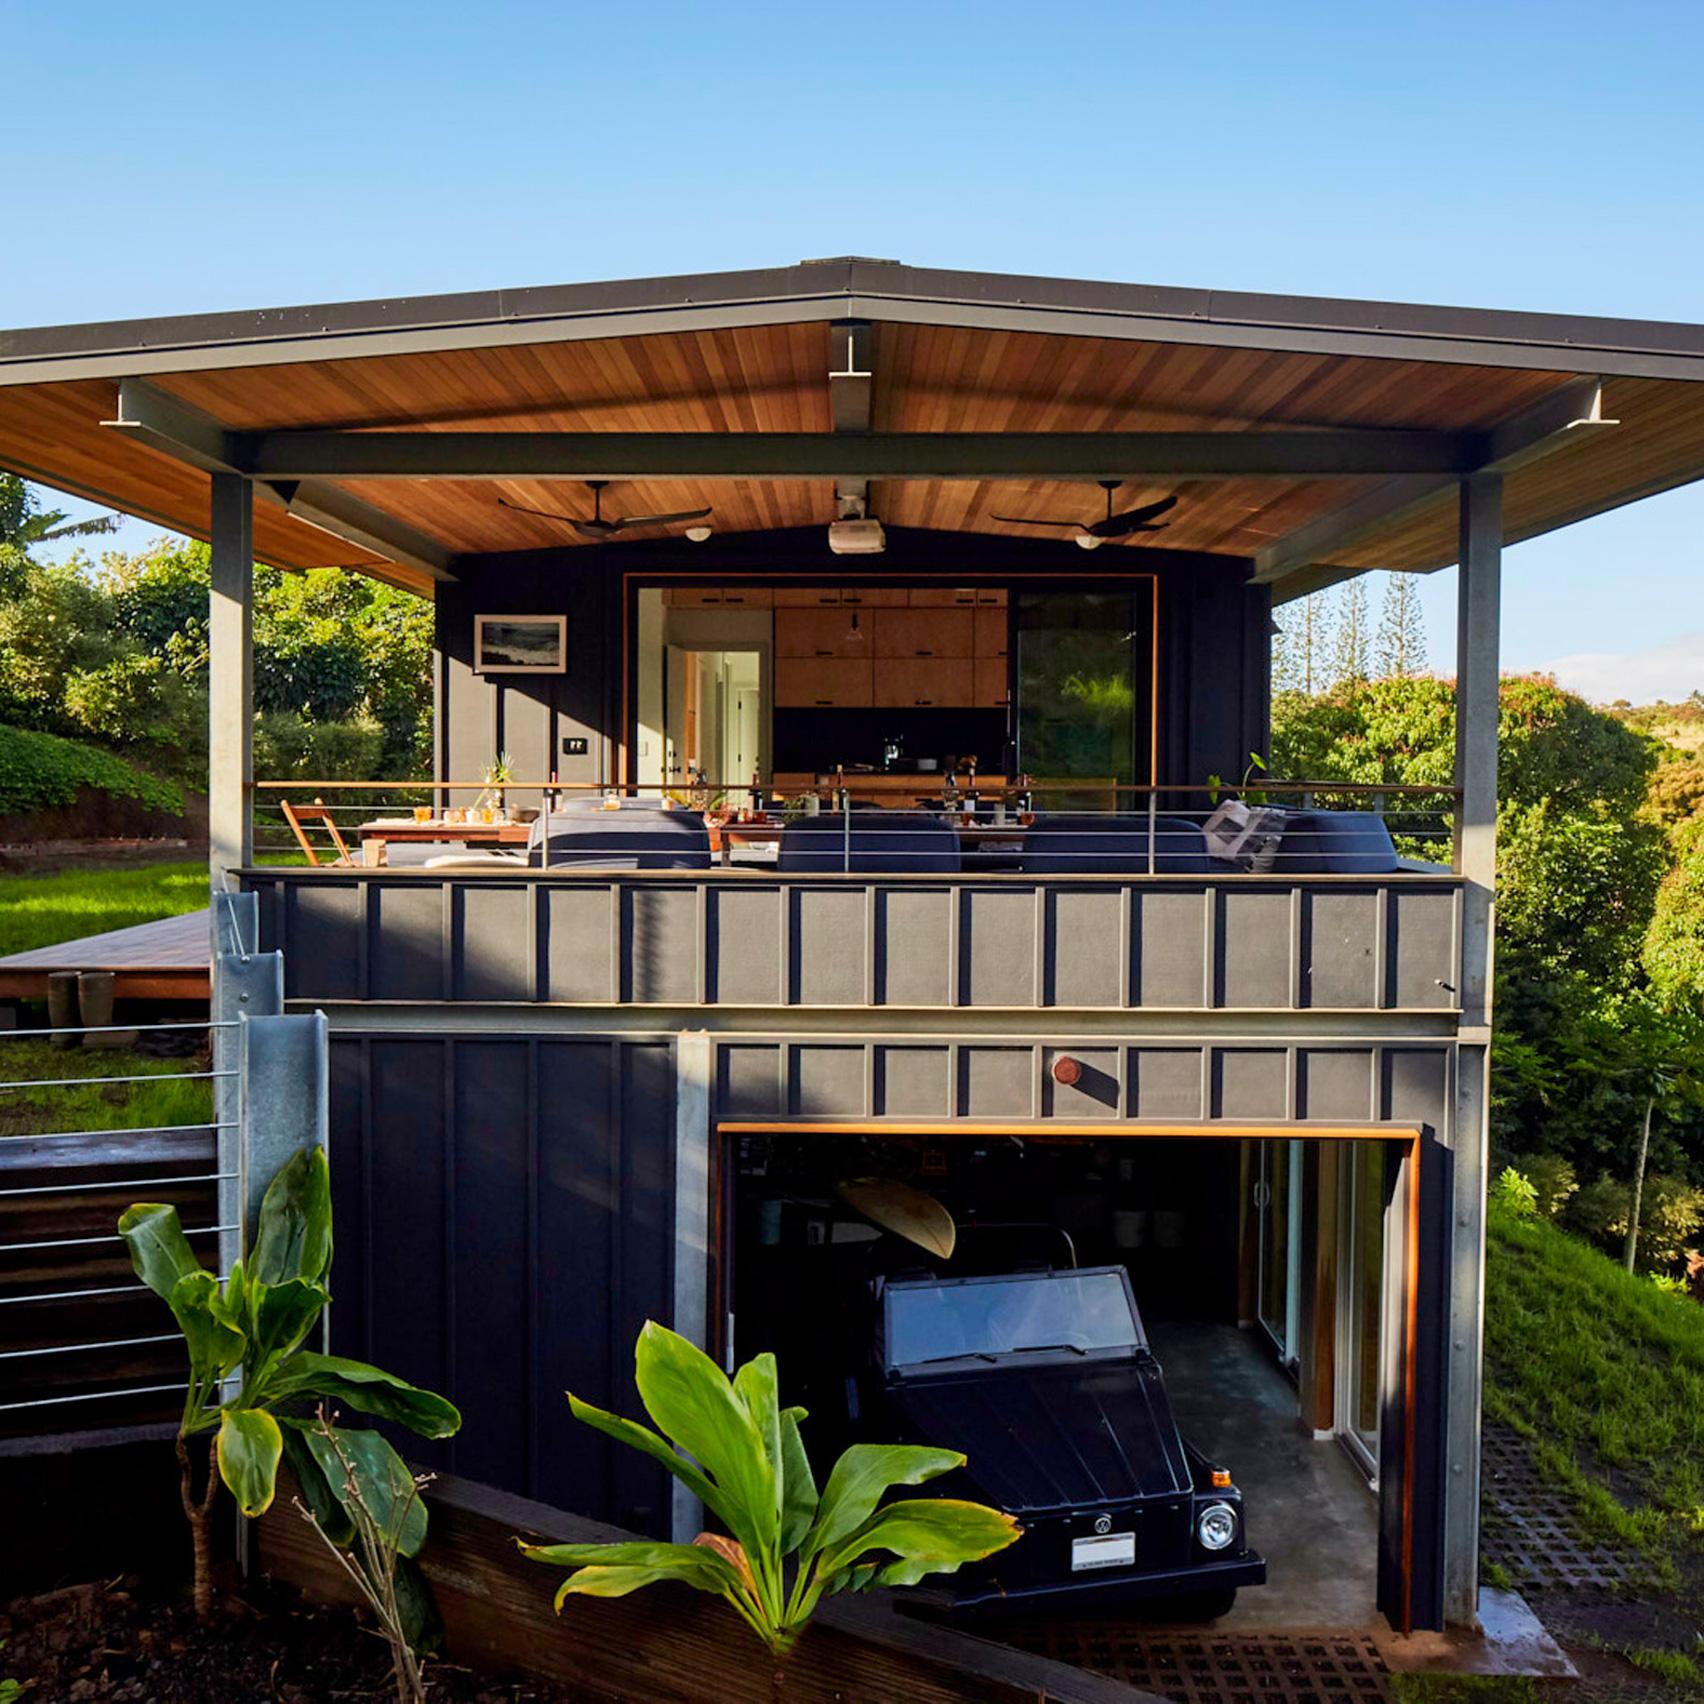 Maui House by Life Edited